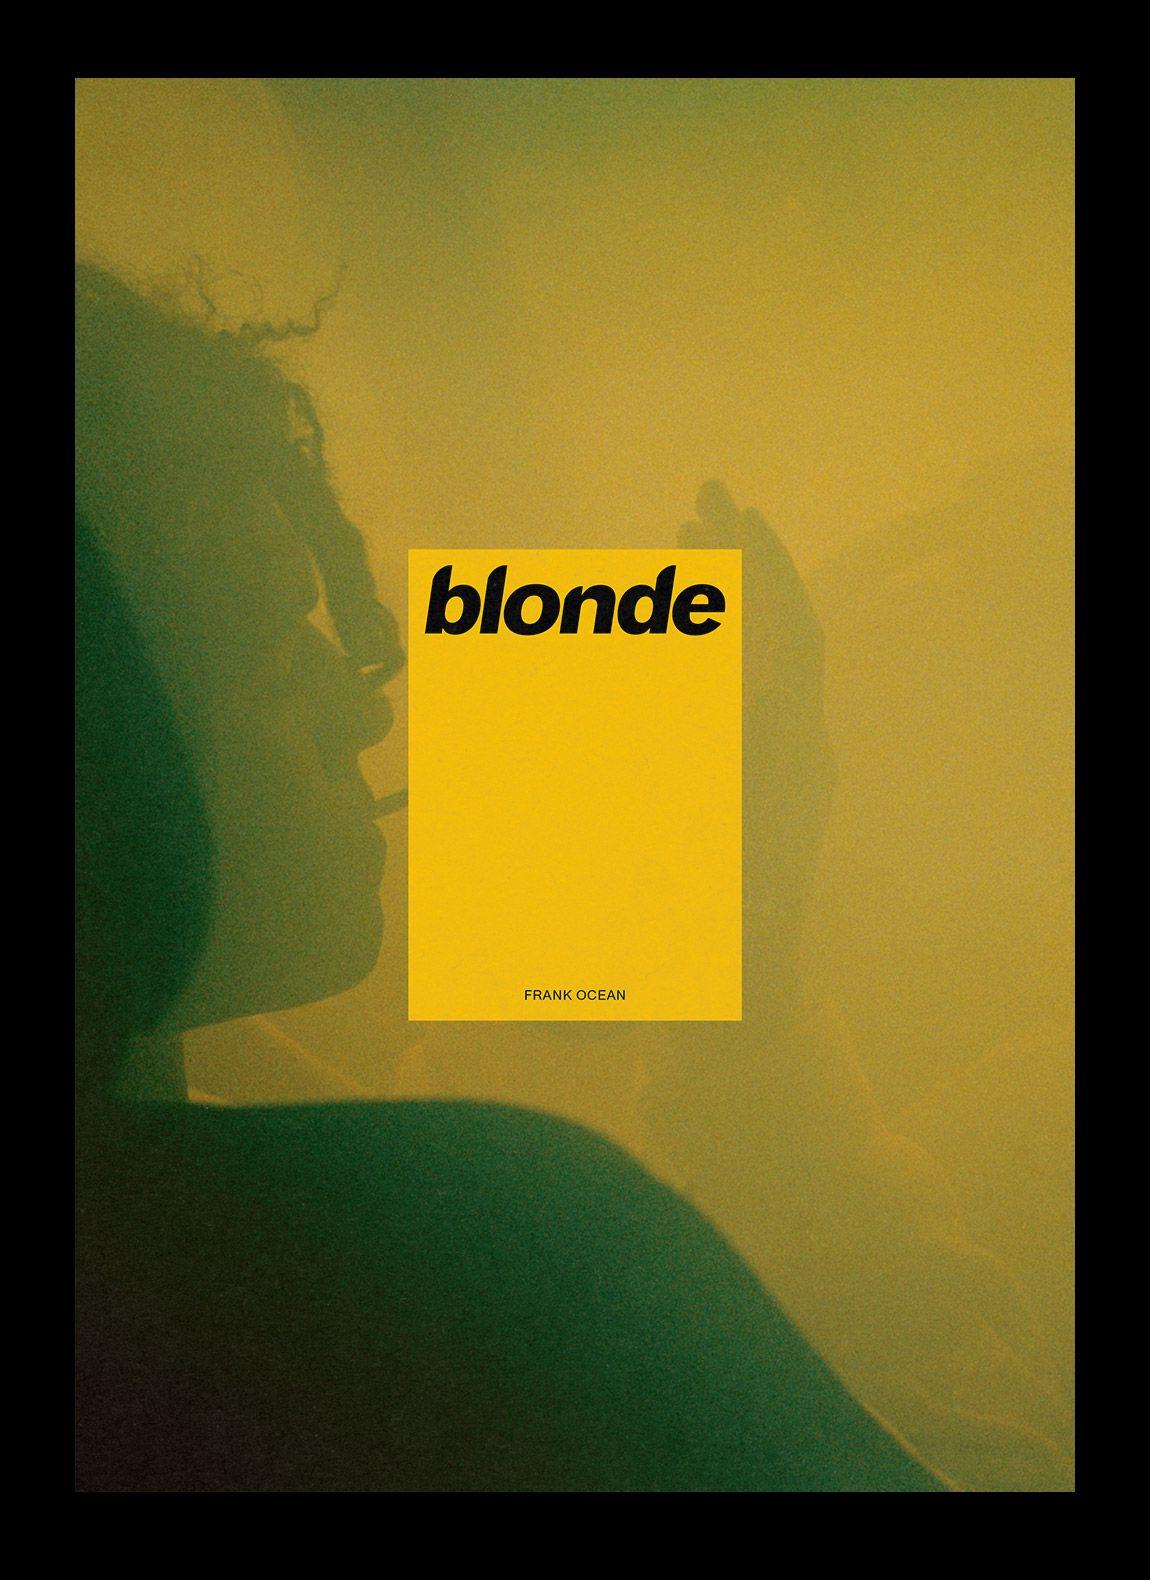 Frank Ocean Blonde Michel Egger Graphic Design For Frank Ocean Photo Frank Ocean Graphic Design Posters